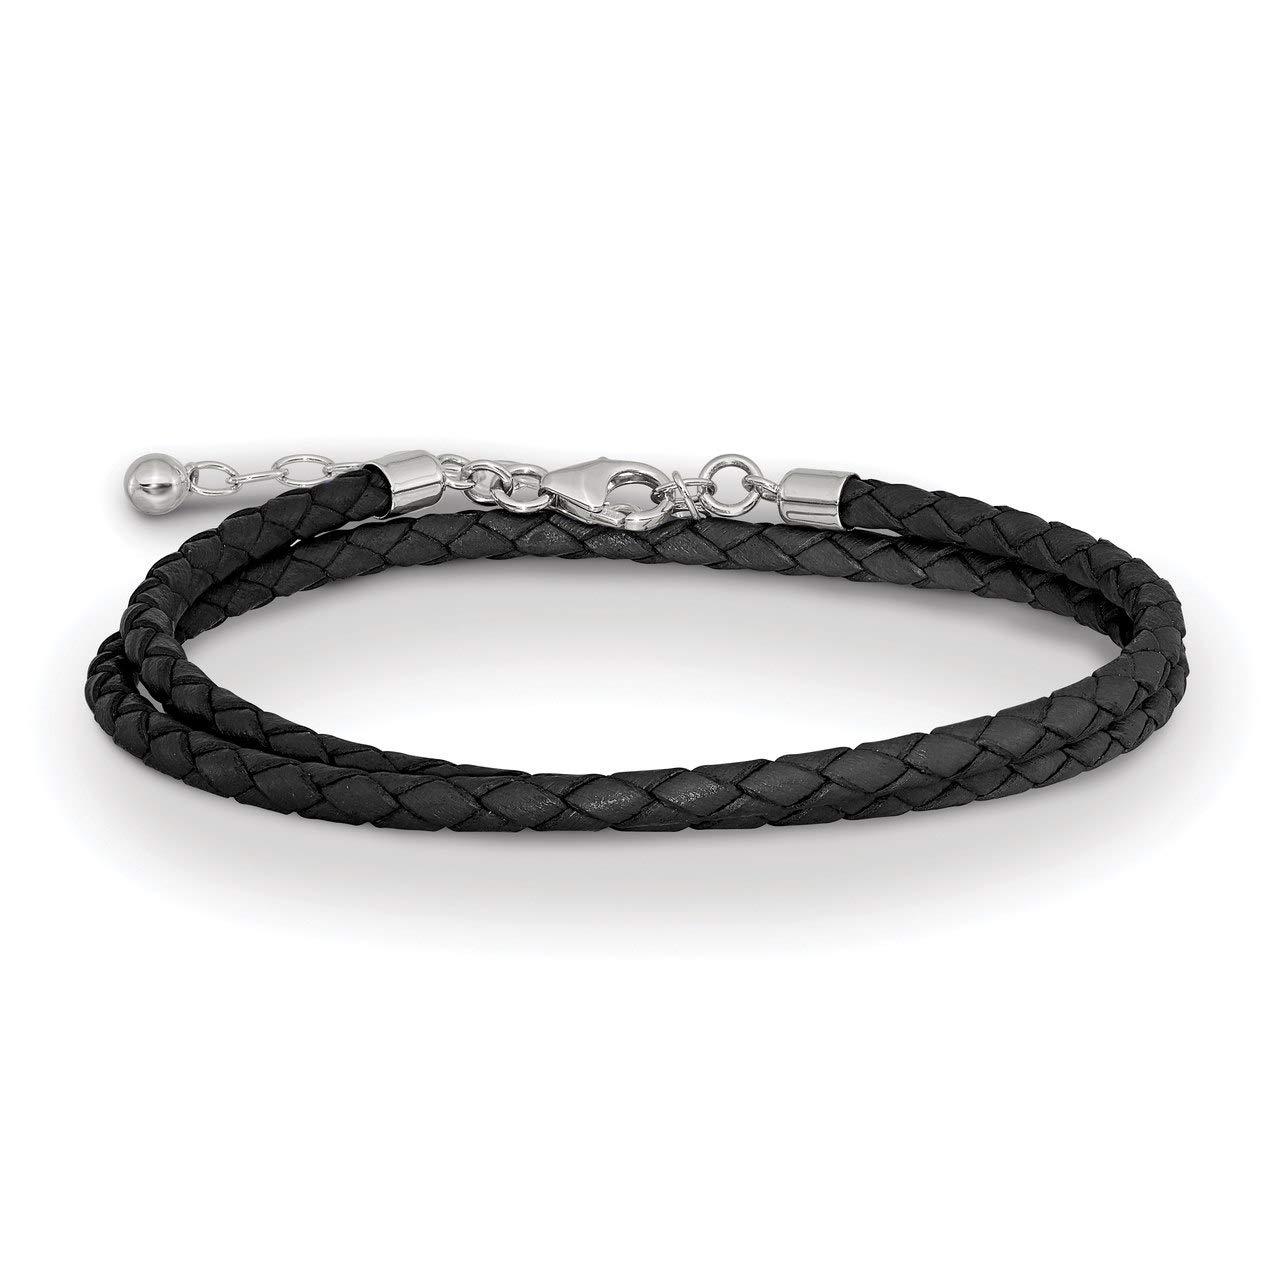 Lex & Lu Sterling Silver Reflections Black Leather 14in w/2'' Ext Choker/Wrap Bracelet-Prime